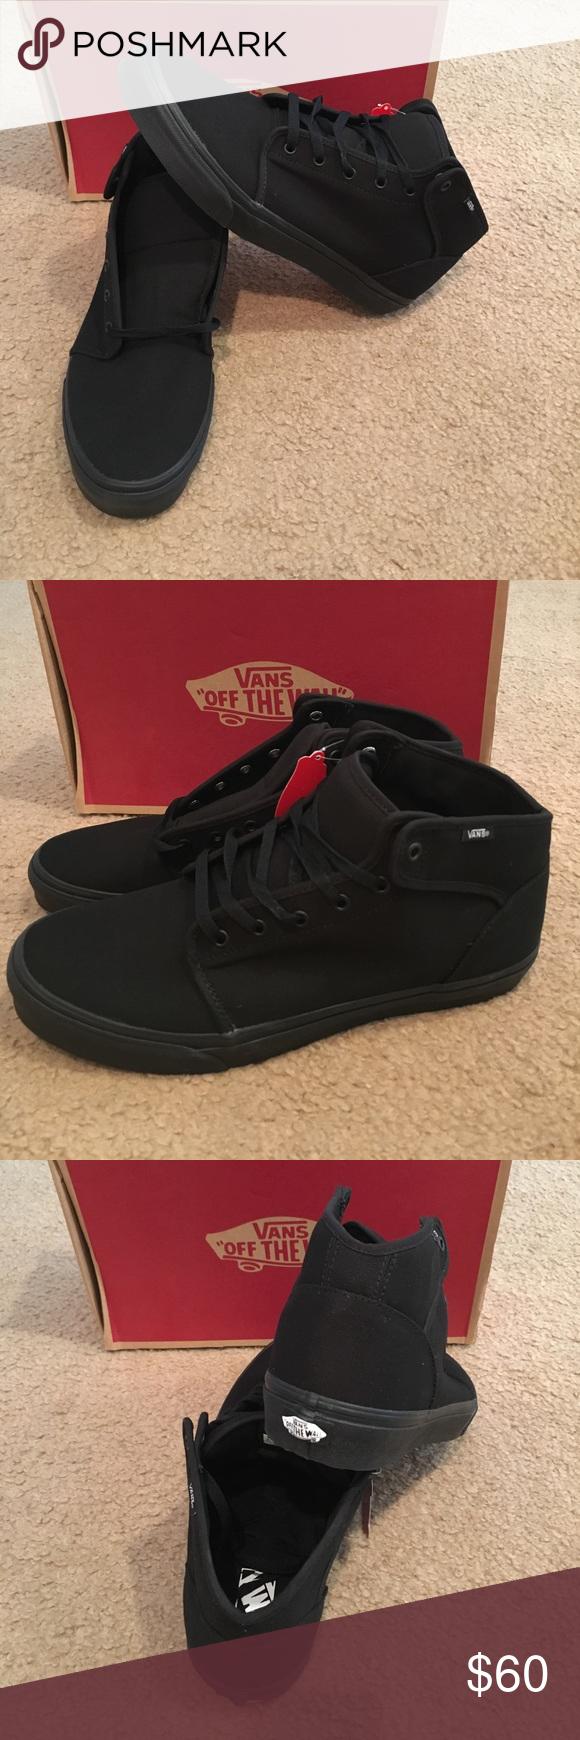 62c765622ac4 Box In New 106 Shoes Black My Mid Sneakers Vans Closet Posh aCCUq